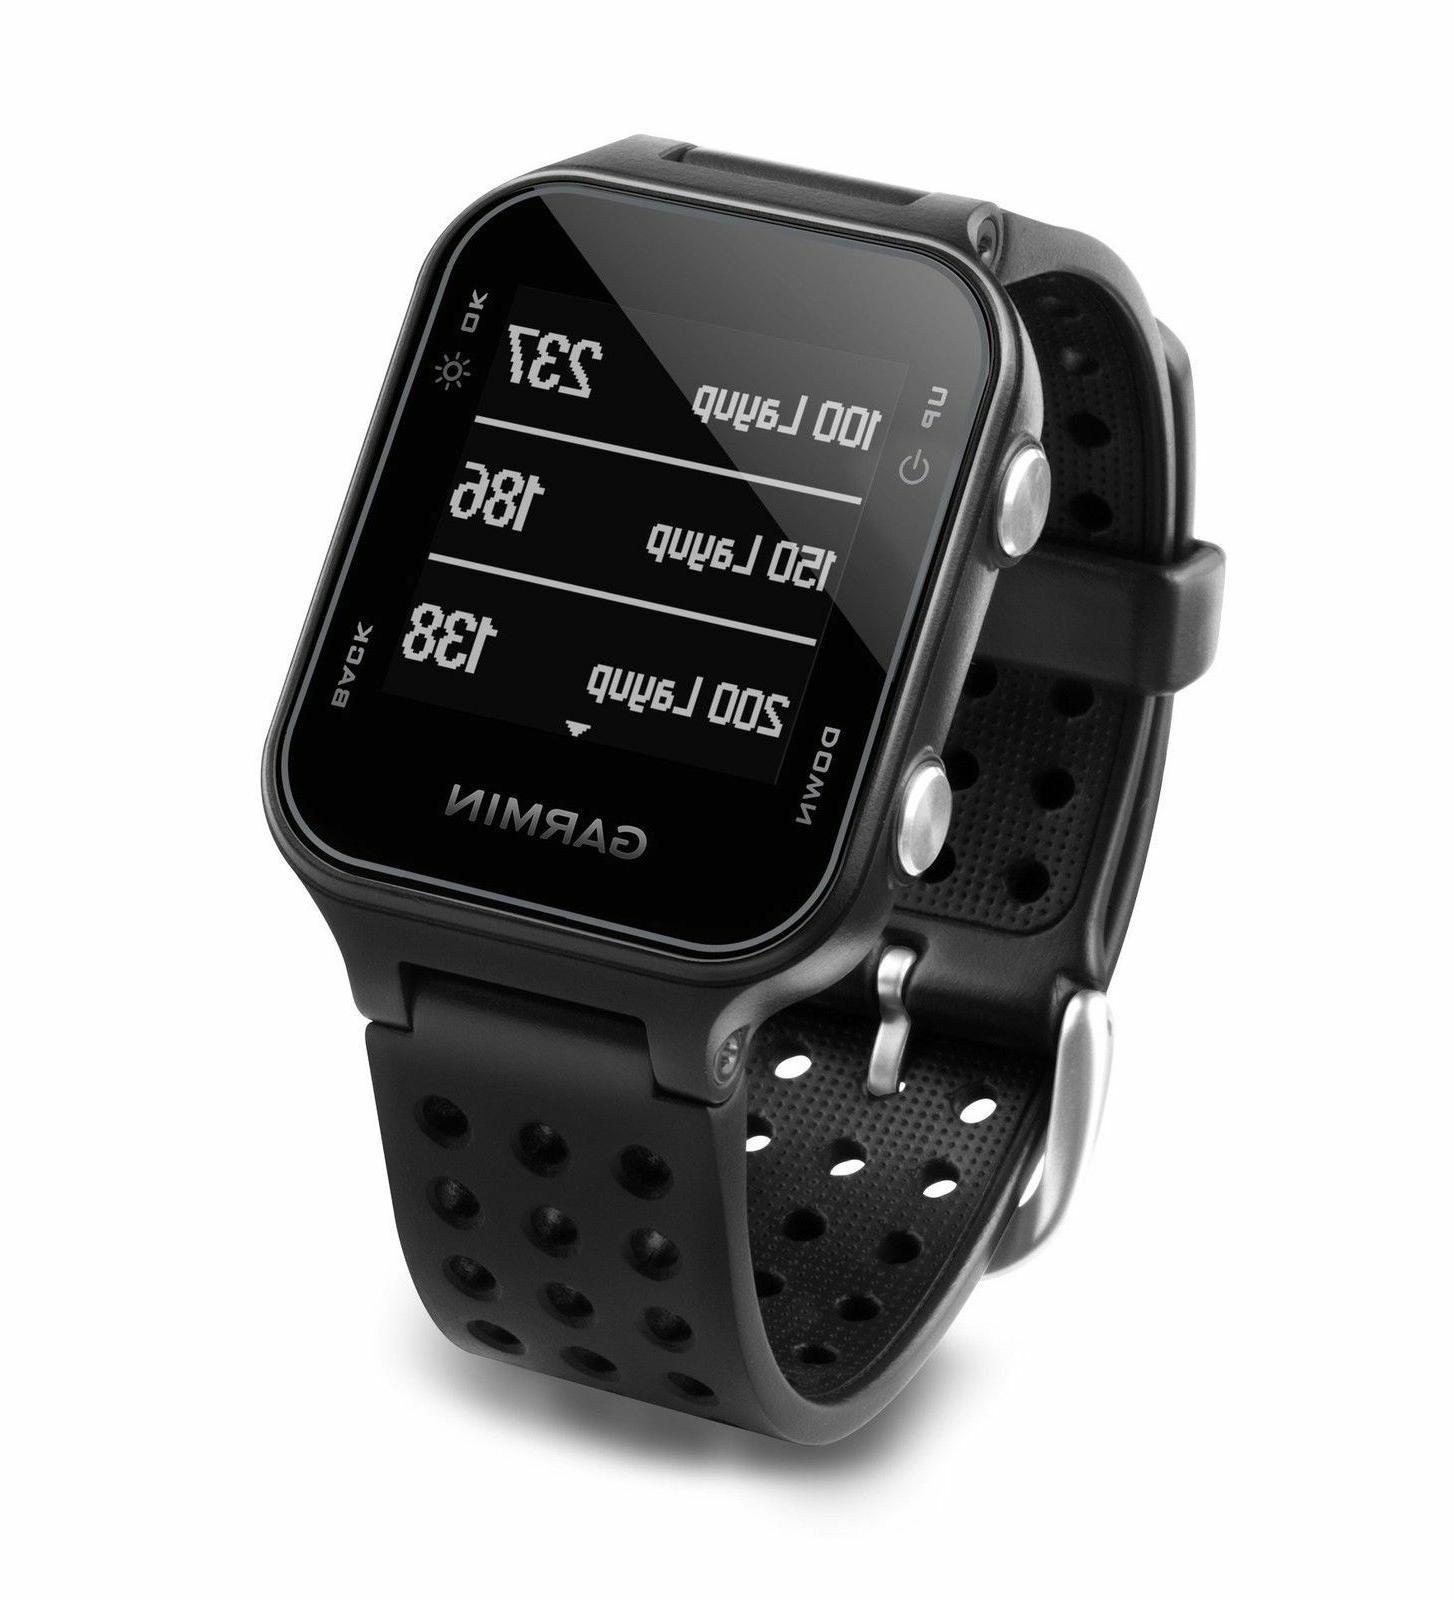 Garmin - Gps Watch